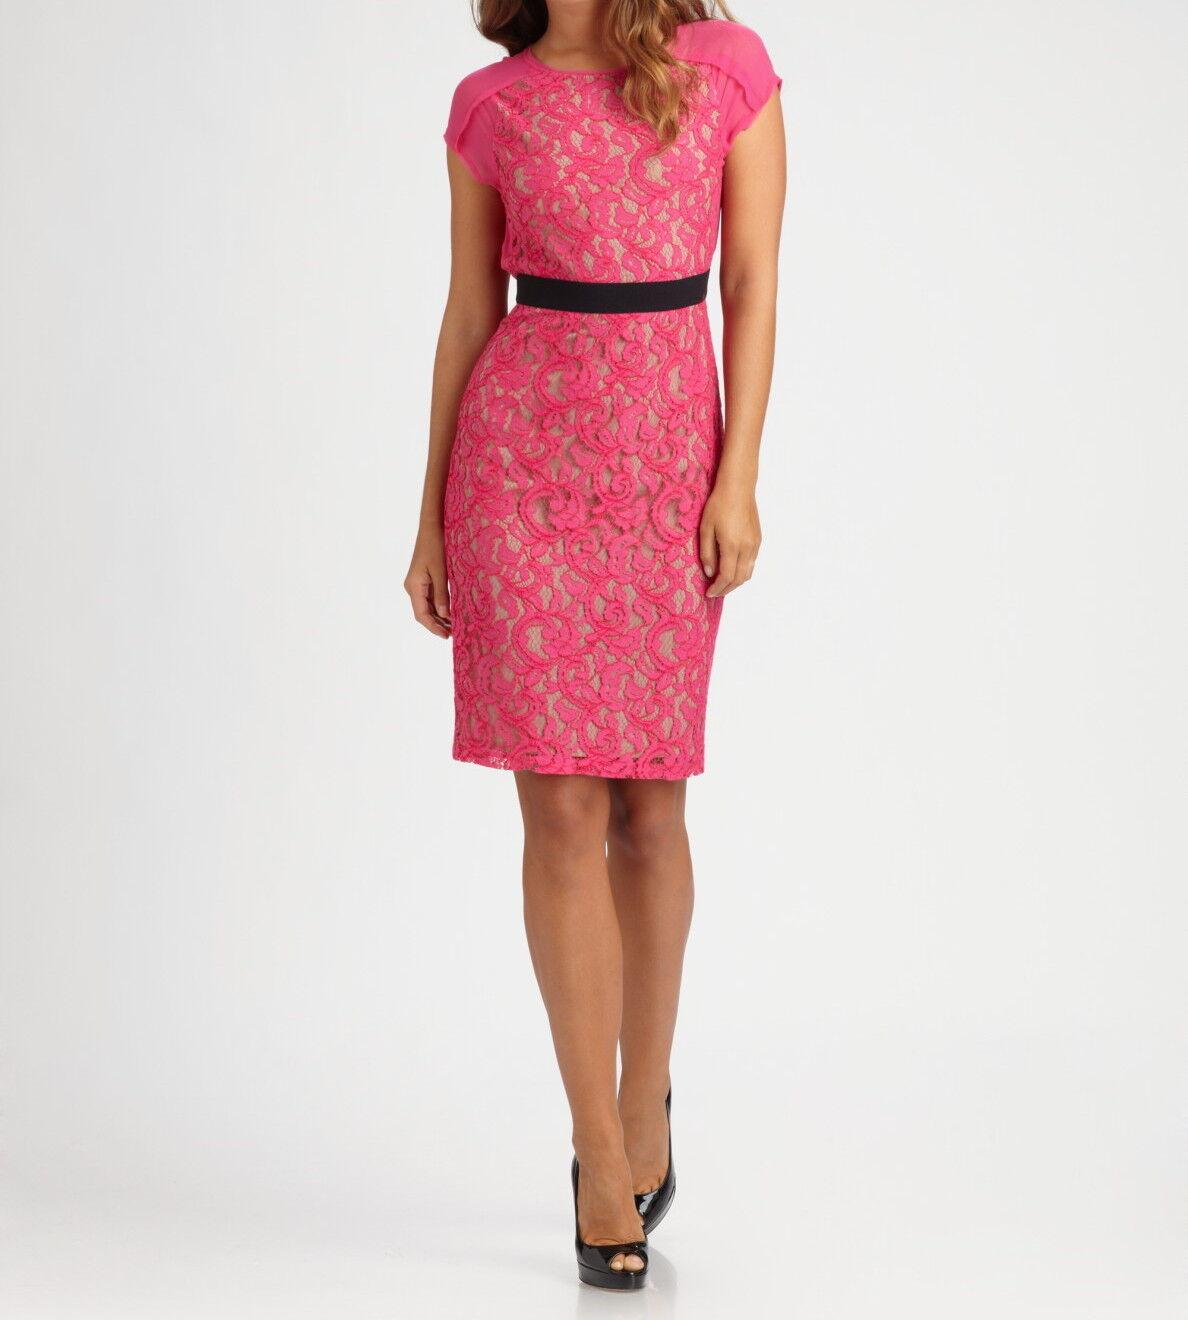 BCBG Max Azria Begonia Chara Lace Dress Eup6u799/m844a Sz 8p | eBay